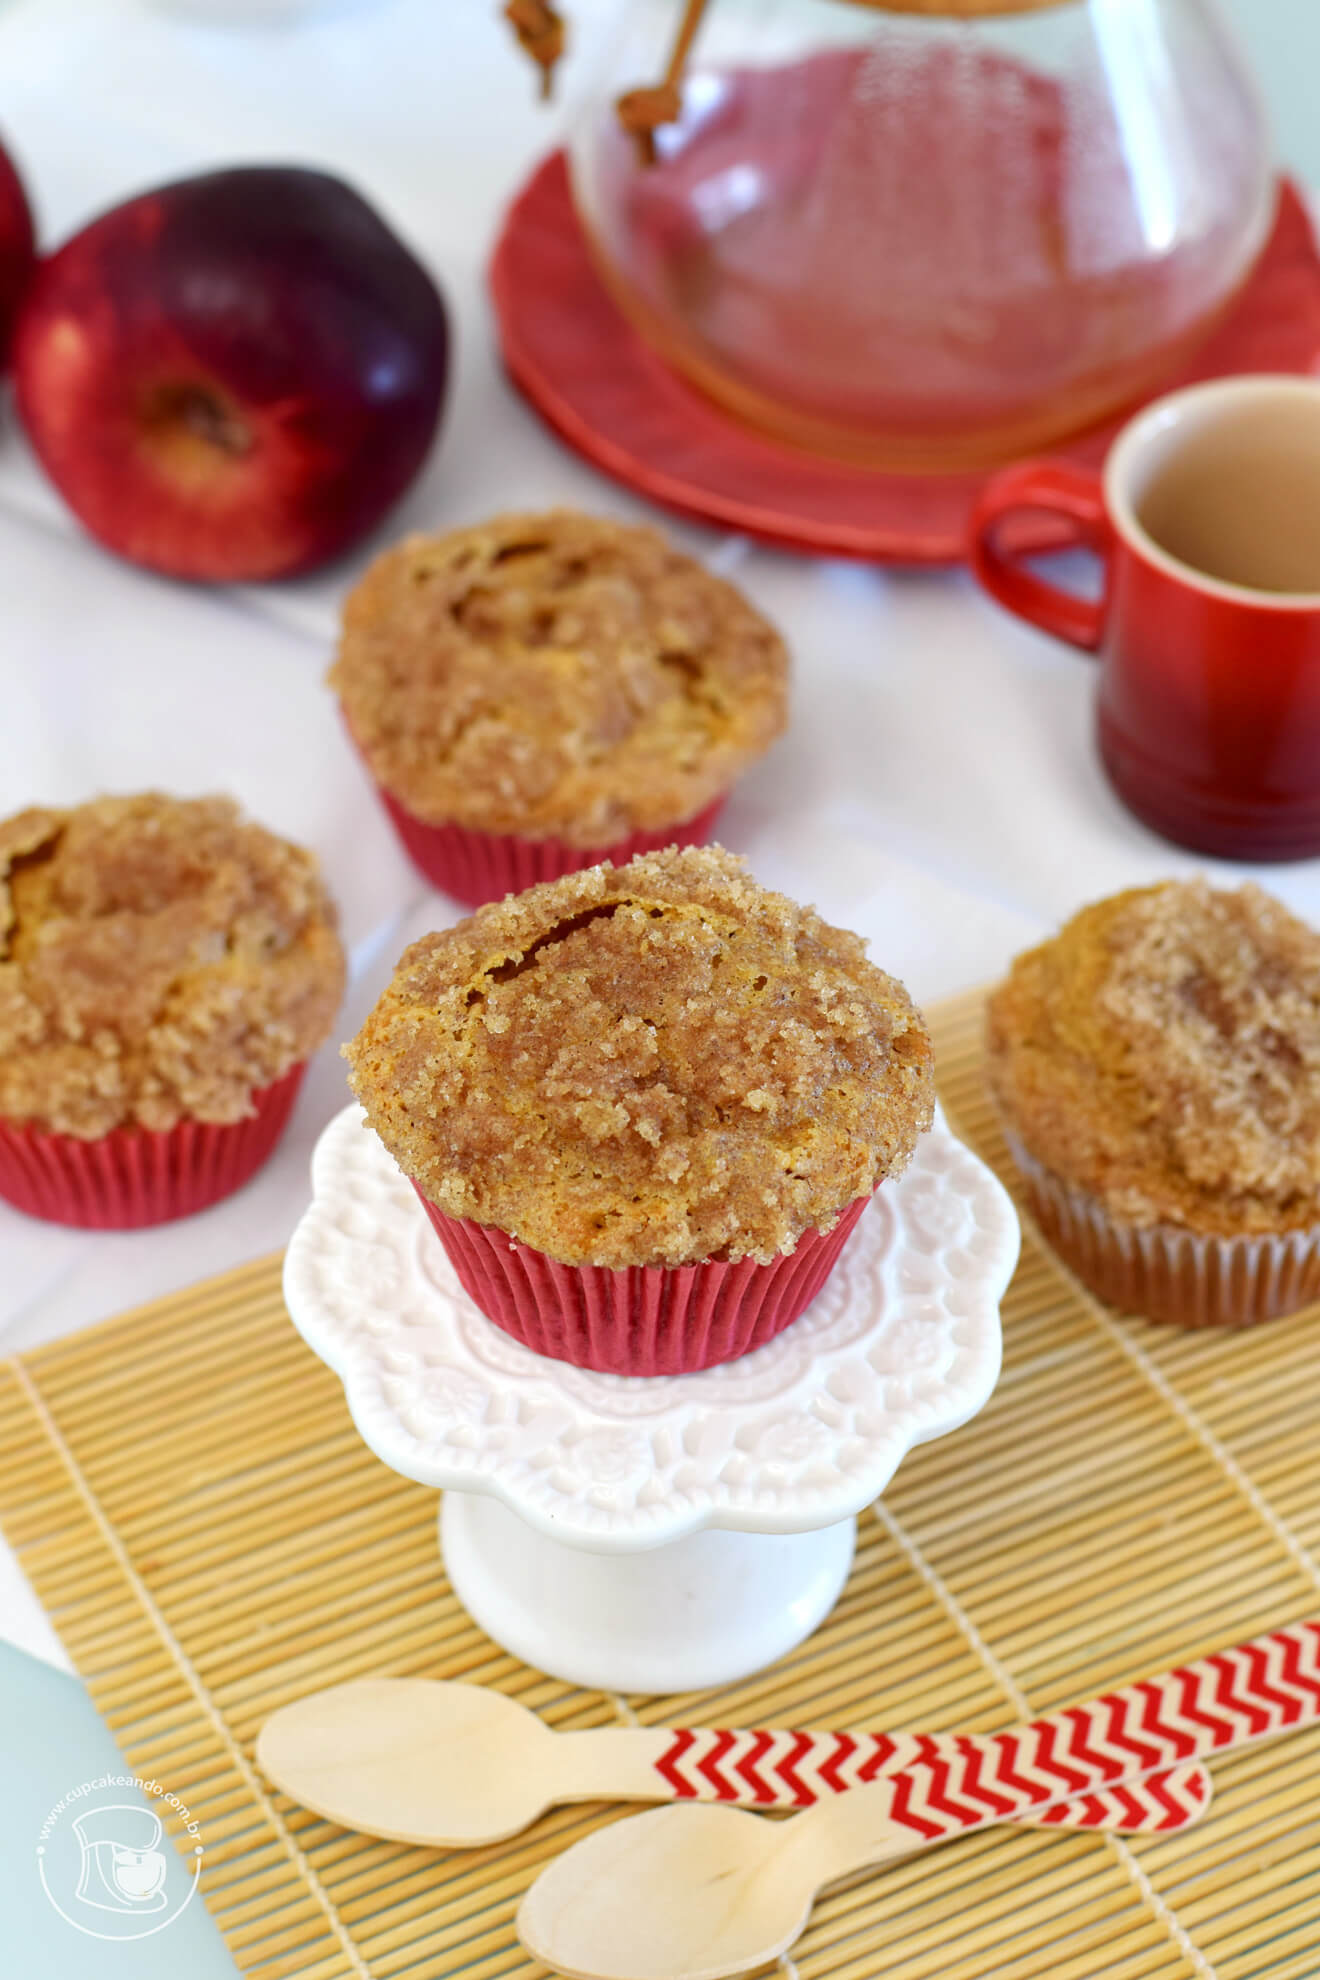 Cupcakes de maçã com crumble de canela